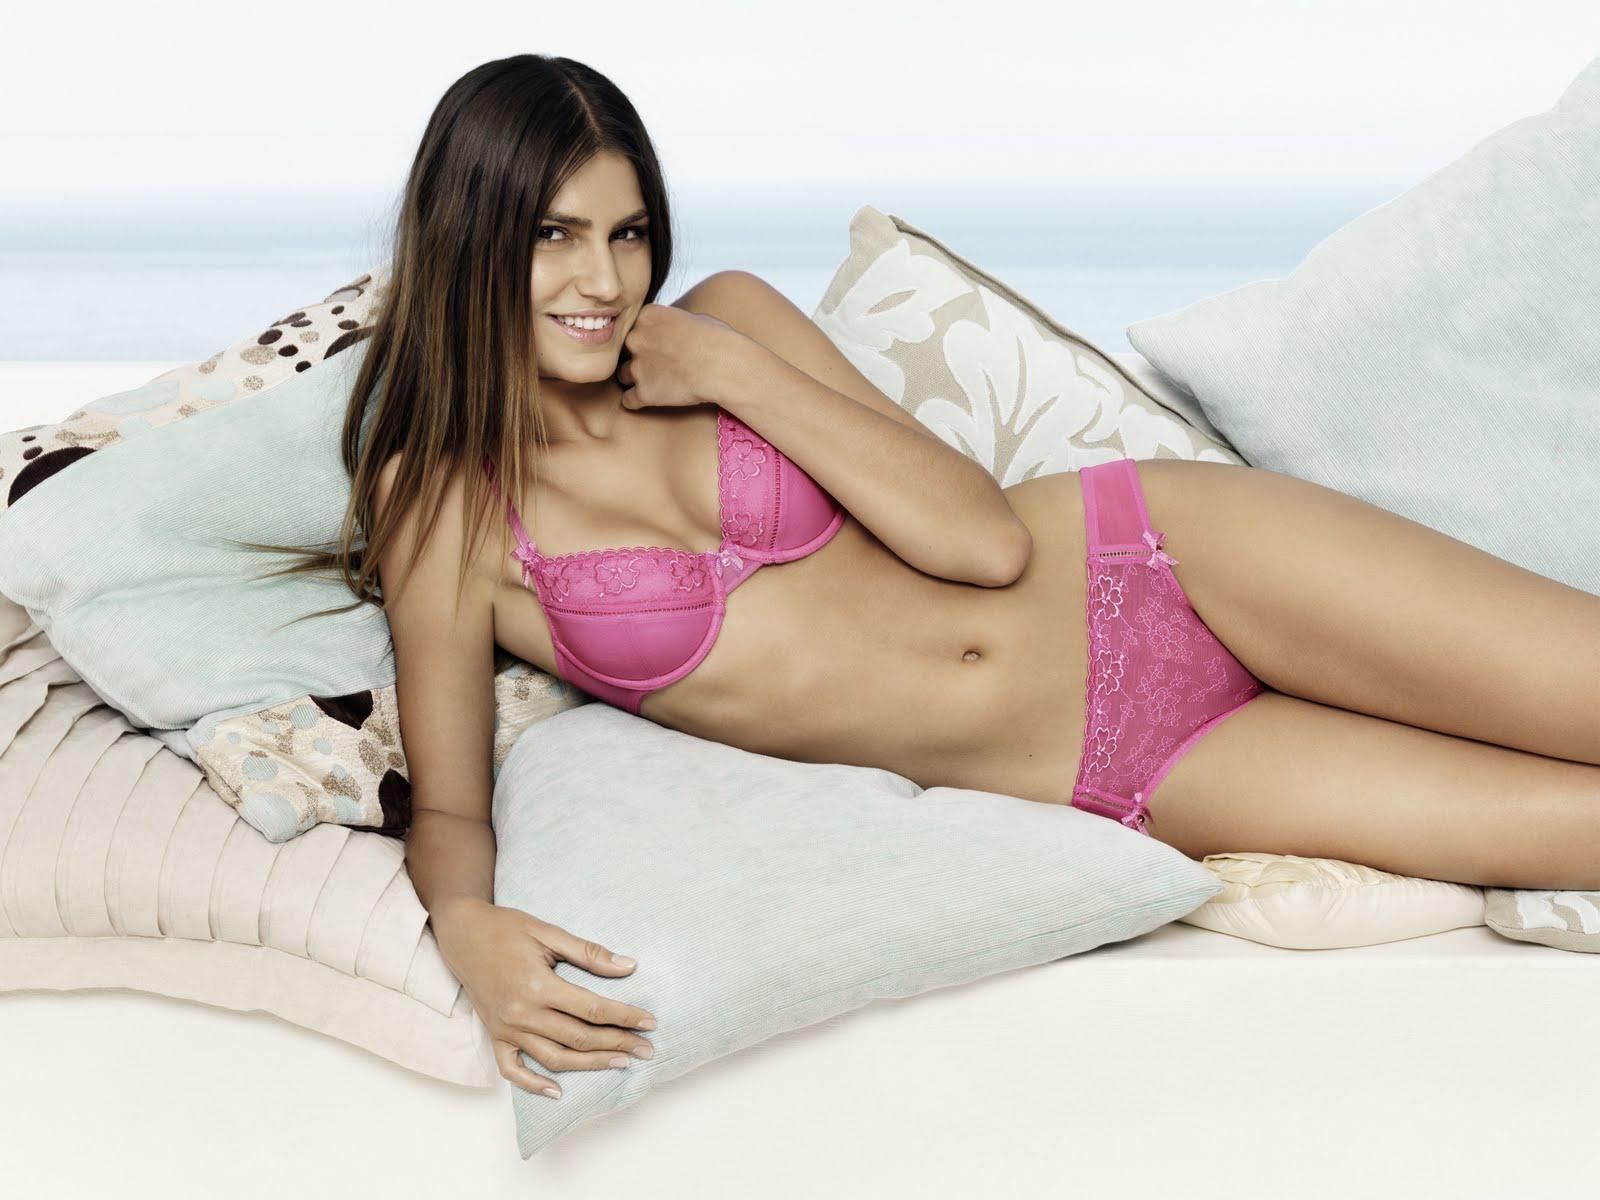 Girls Hd Wallpapers Juliana Martins Brazilian Models The Premium Gallery